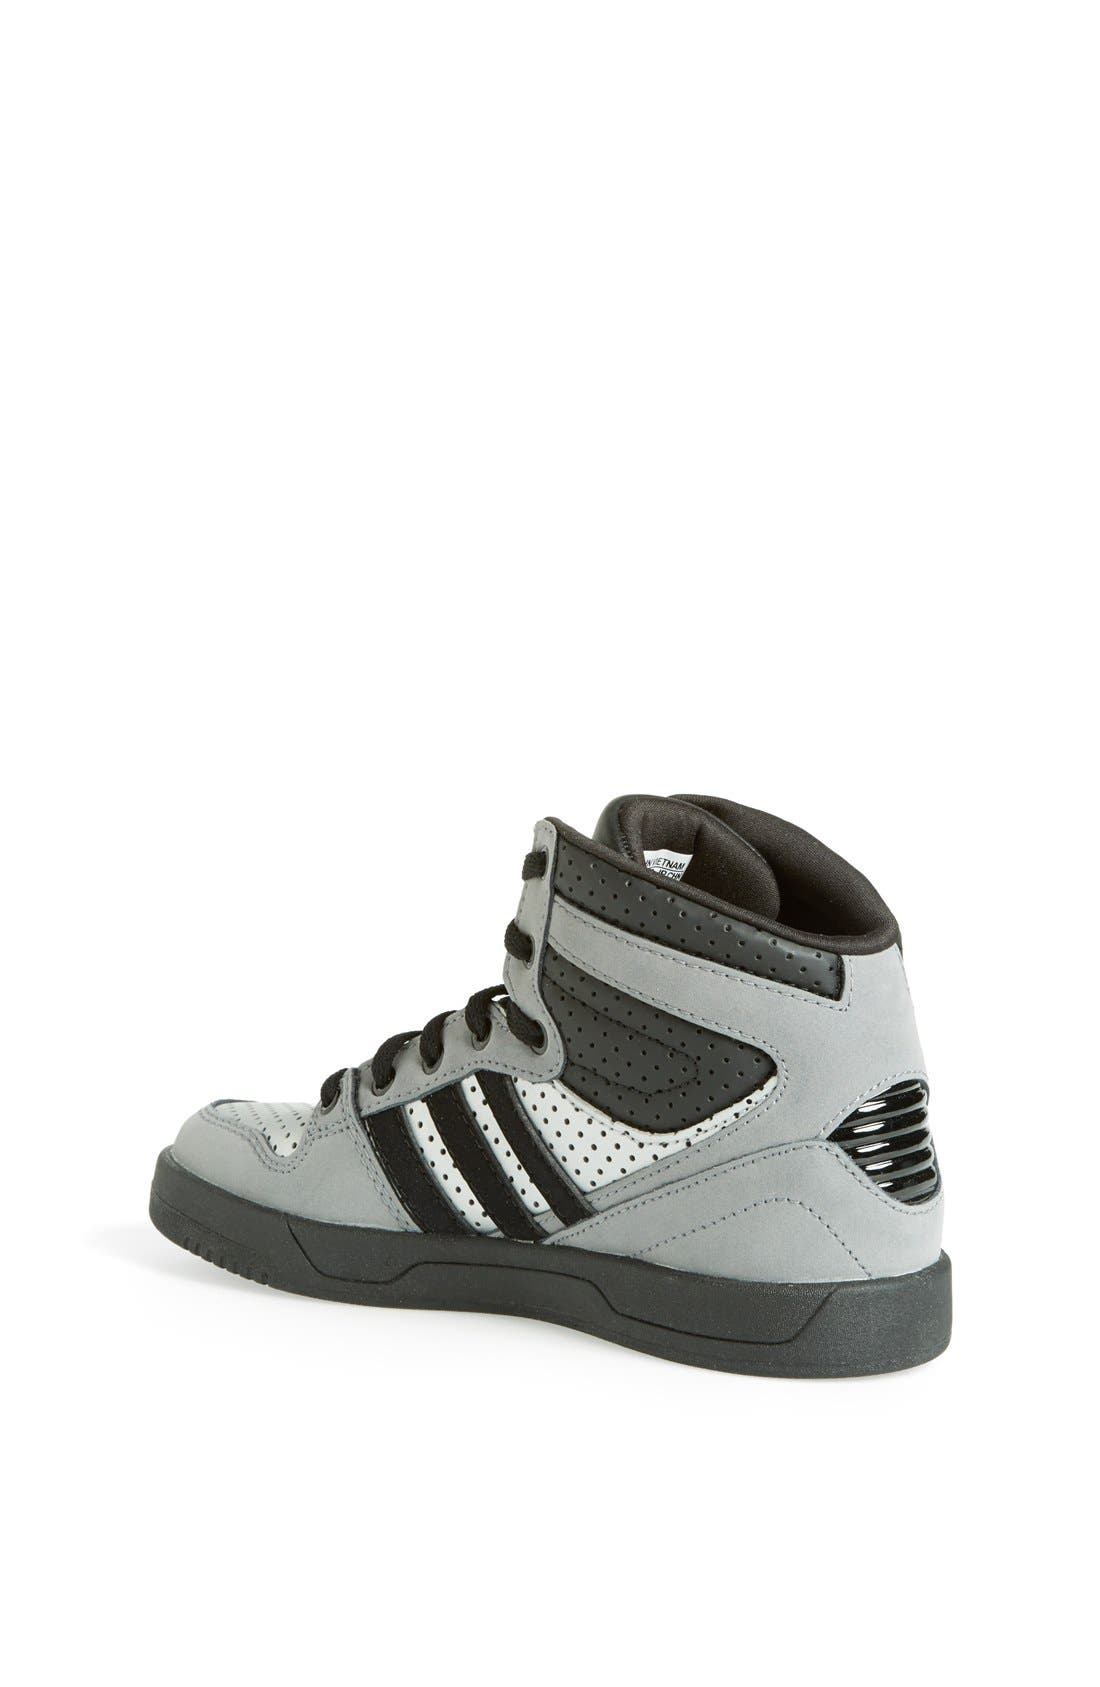 Alternate Image 2  - adidas 'Court Attitude' Sneaker (Toddler, Little Kid & Big Kid)